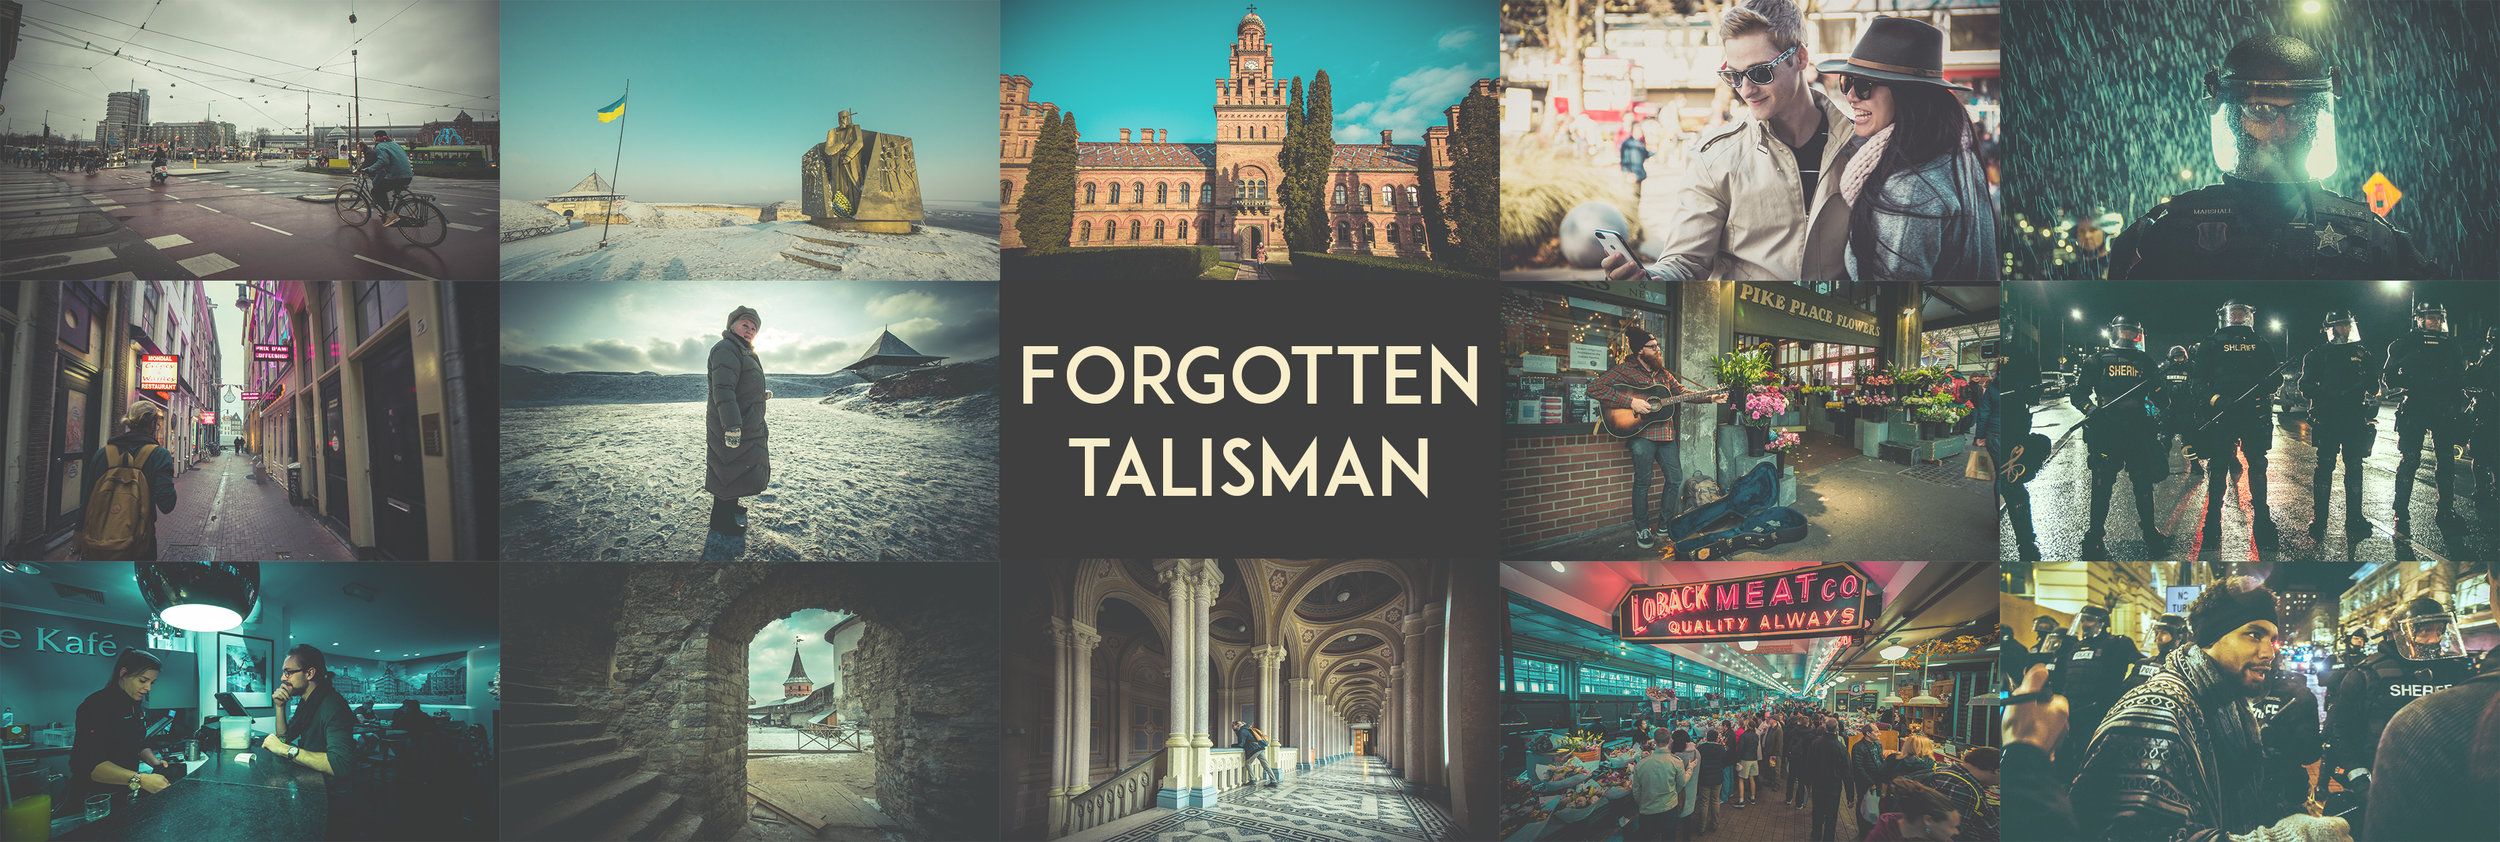 ForgottenTalisman